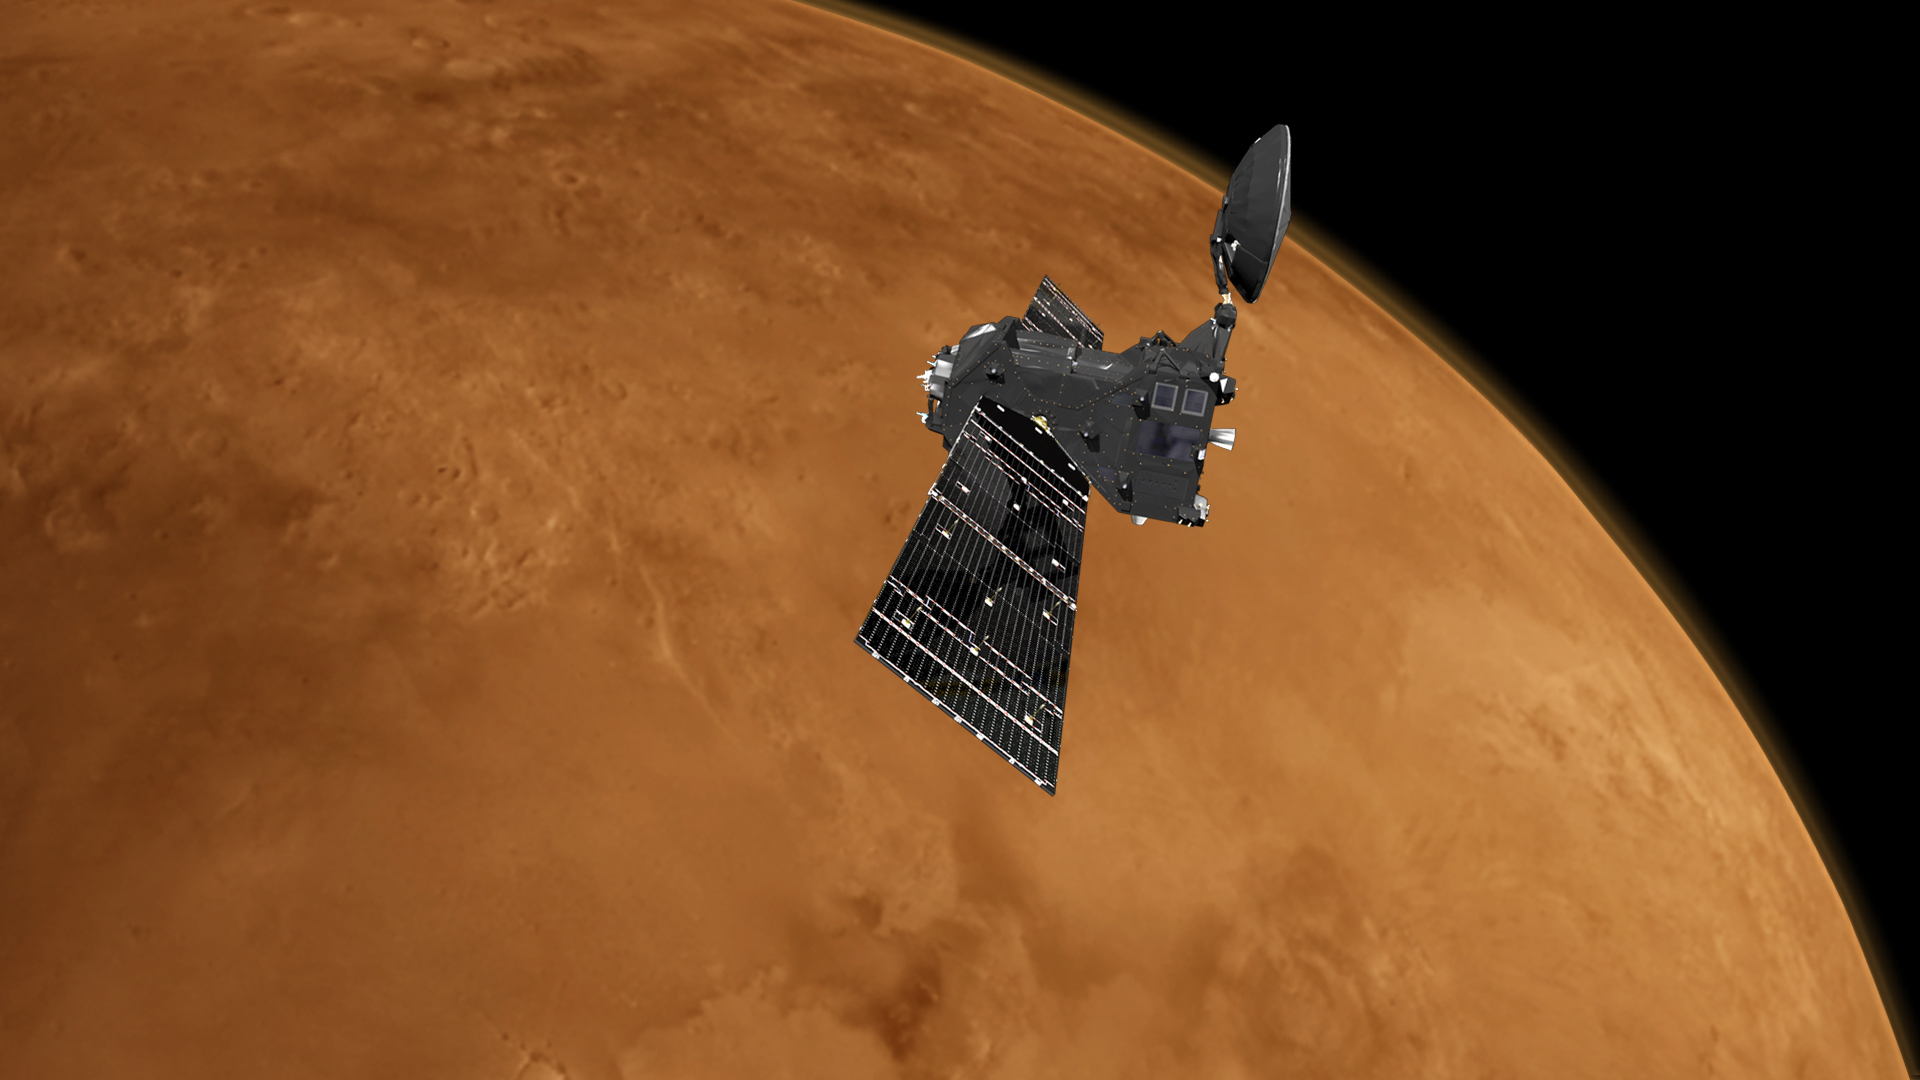 Artist's concept of Europe's ExoMars Trace Gas Orbiter at Mars. Credit: ESA/ATG medialab